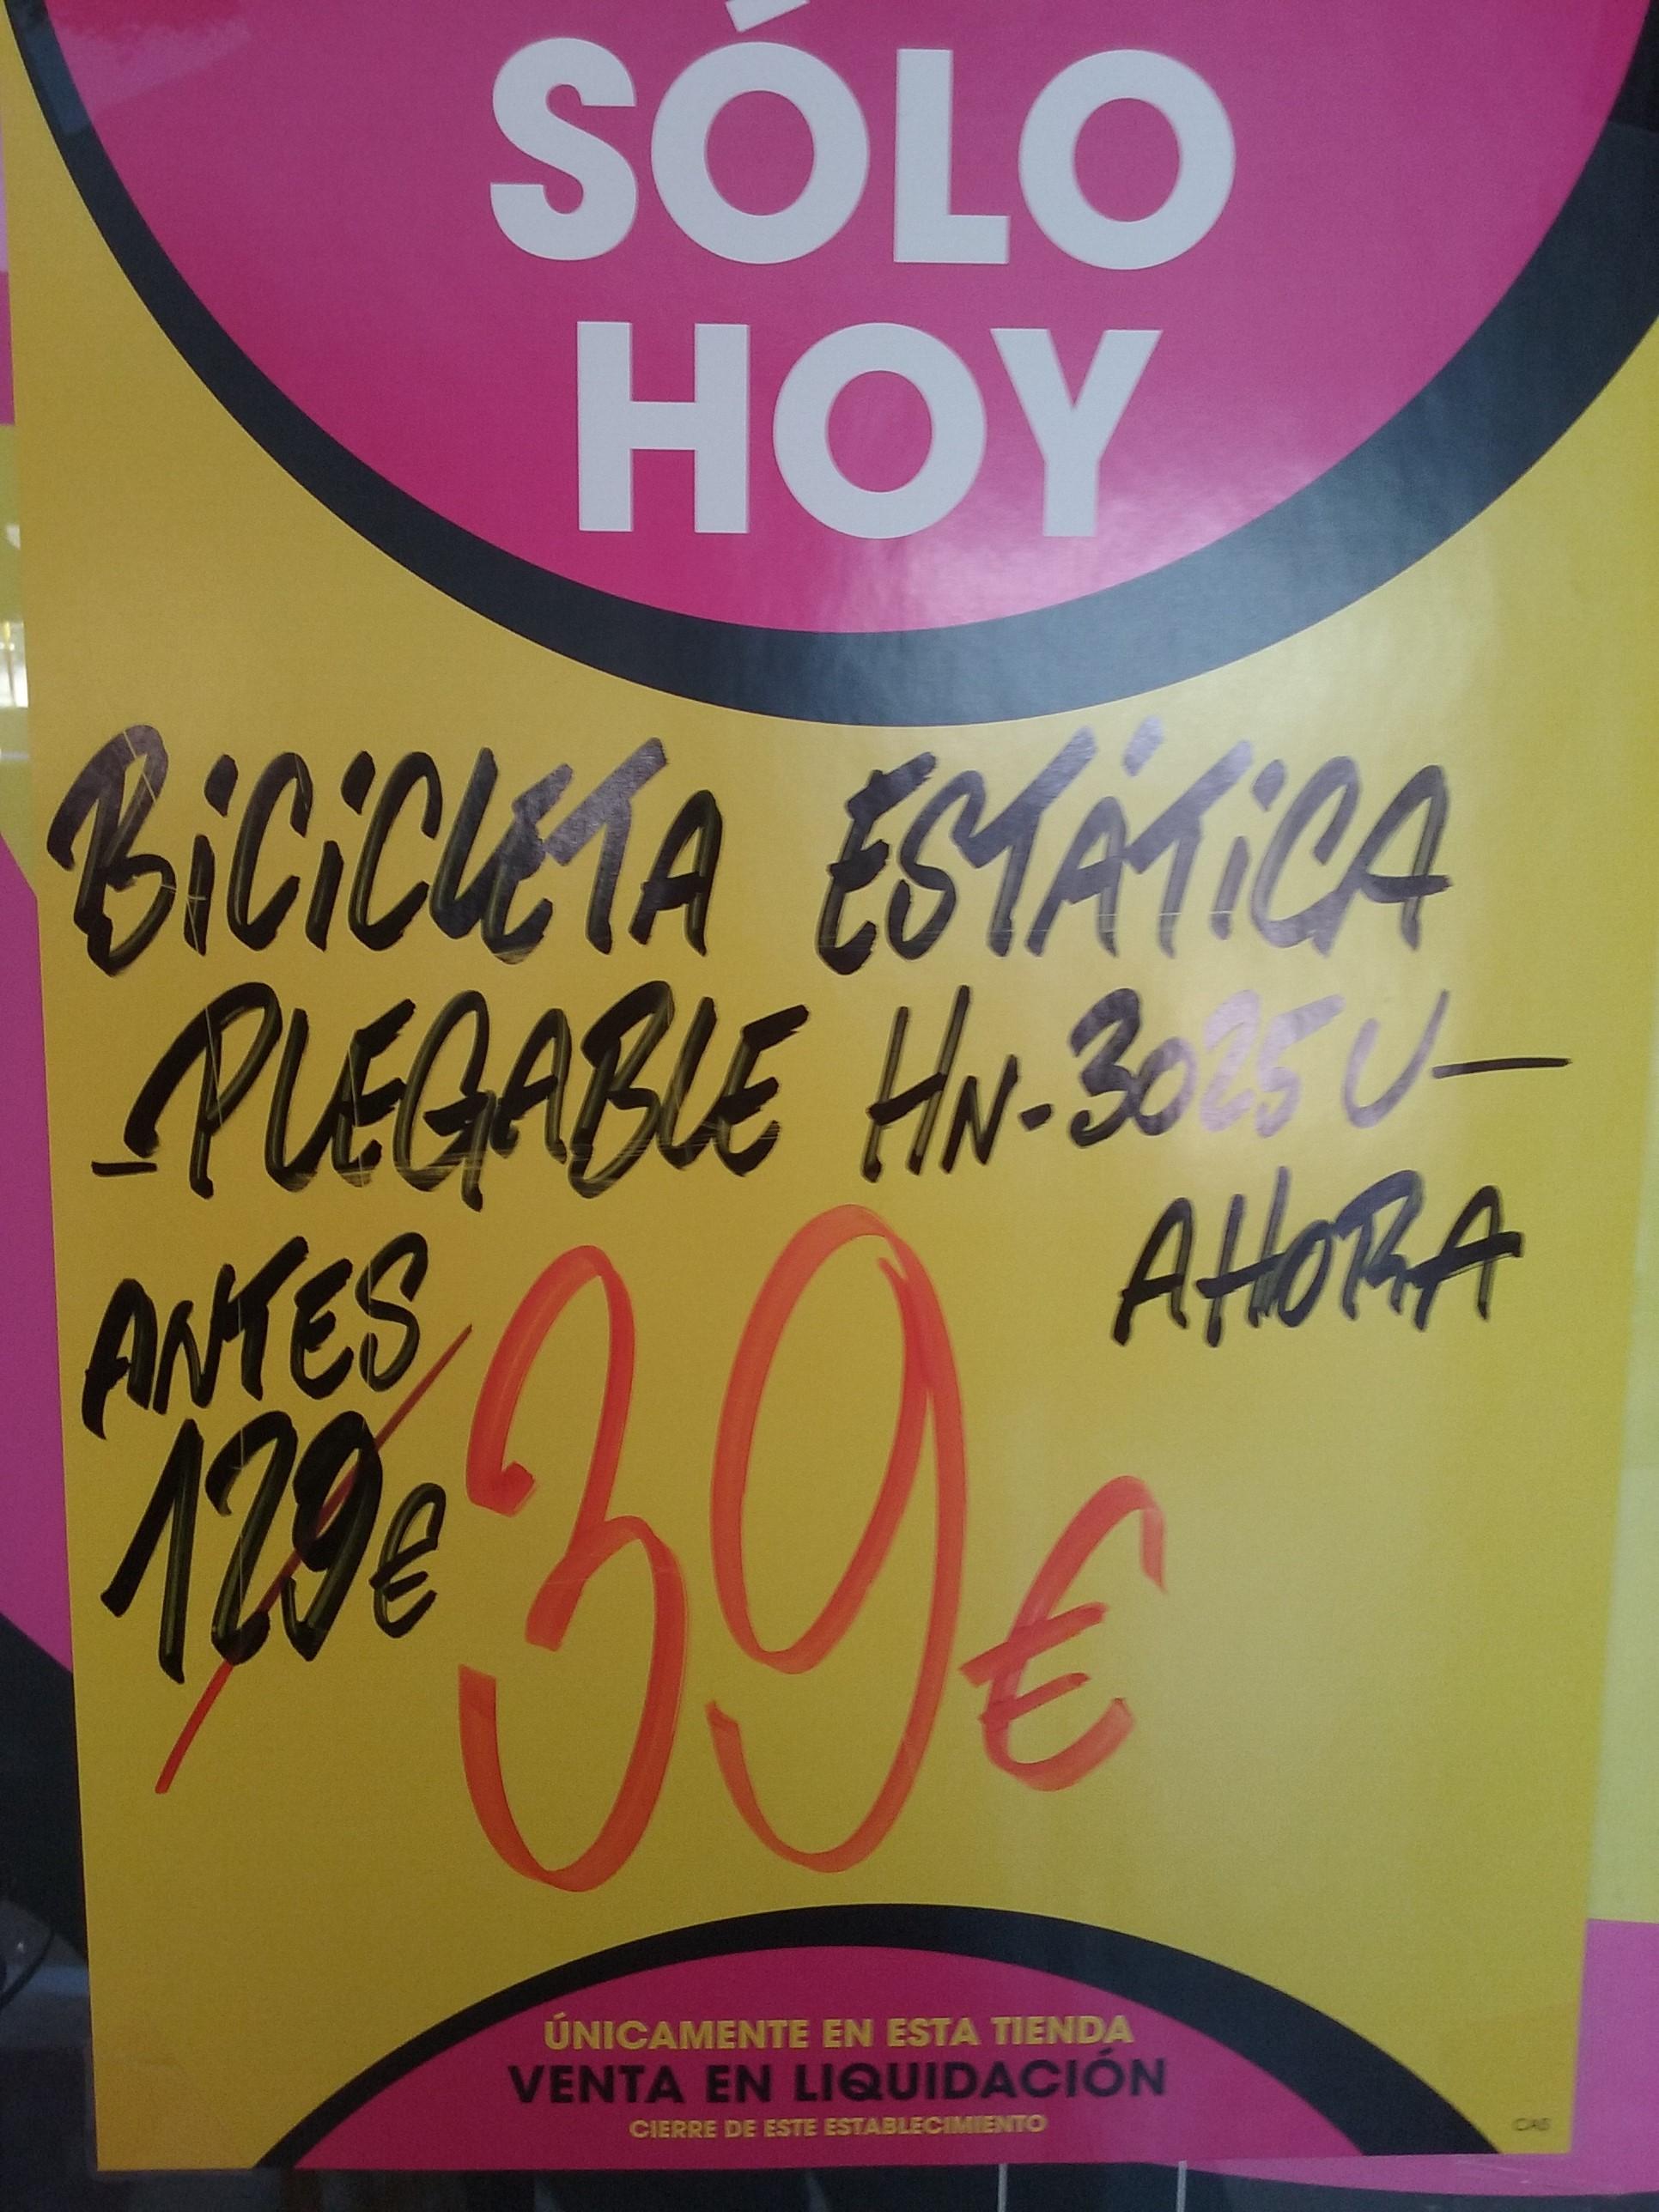 Bicicleta estática plegable HN-3025U Eroski Cartagena